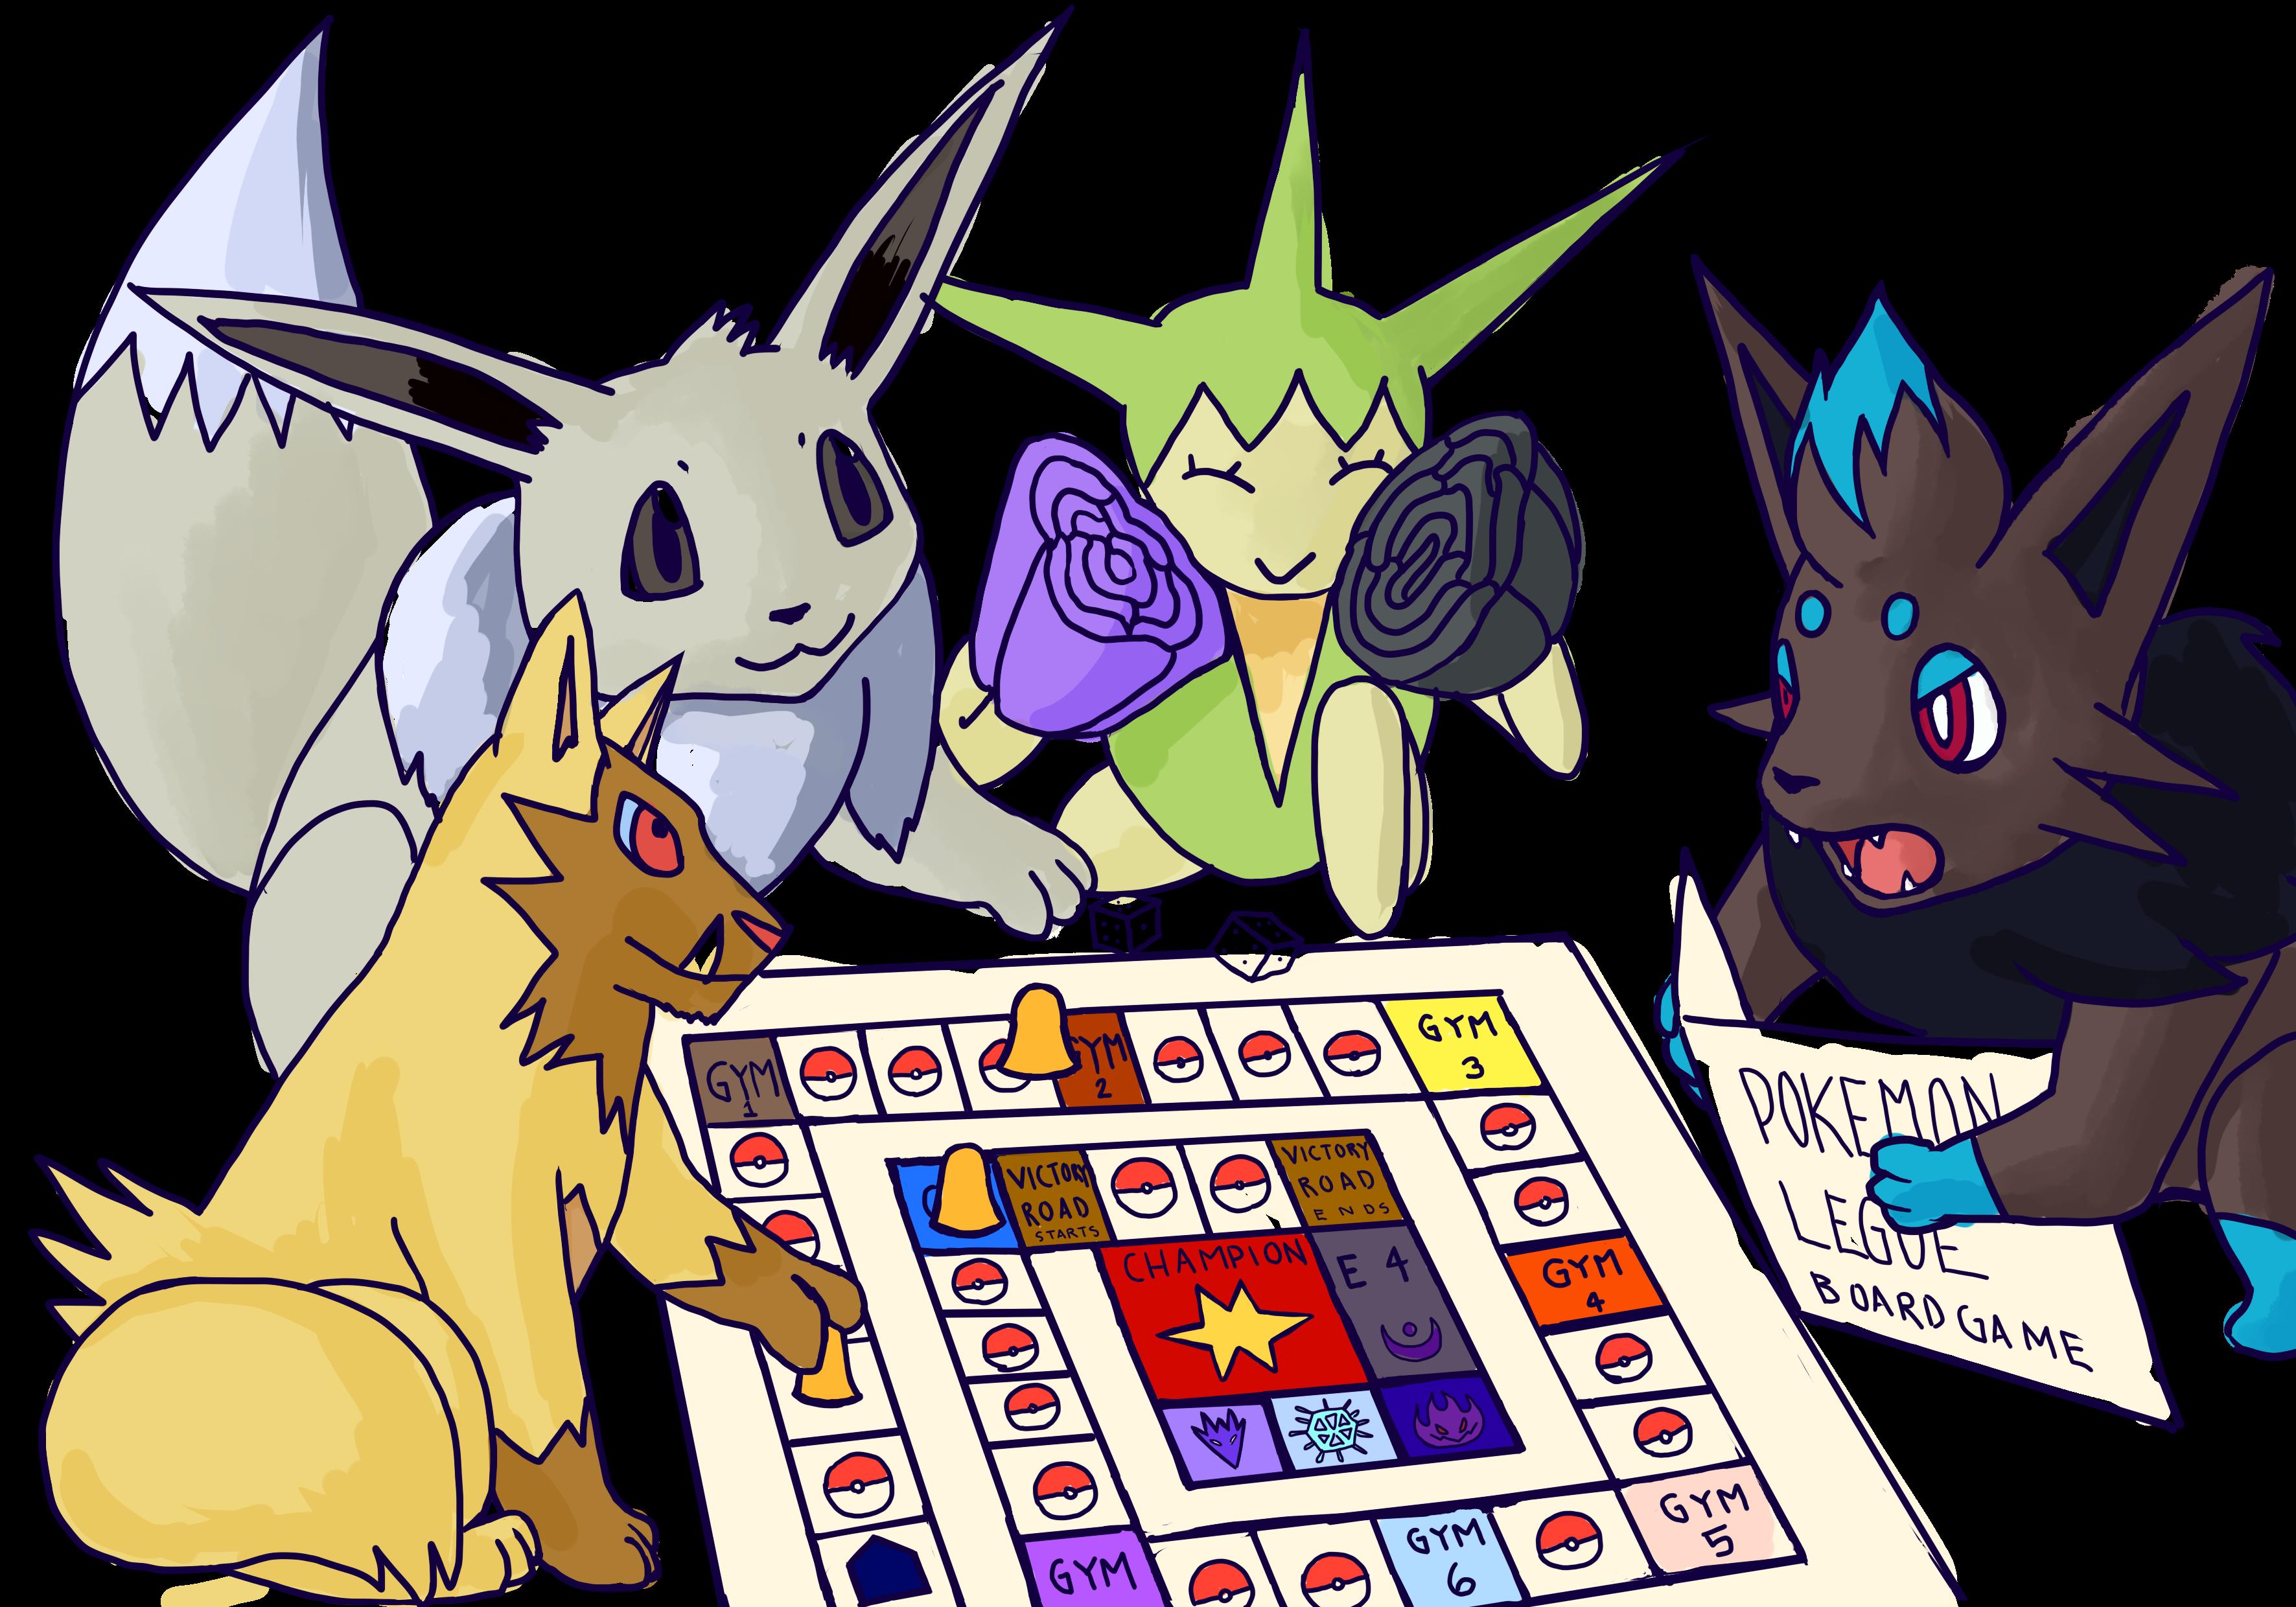 3543x2480 My Shiny Pokemon Playing A Board Game By Lupa Femina